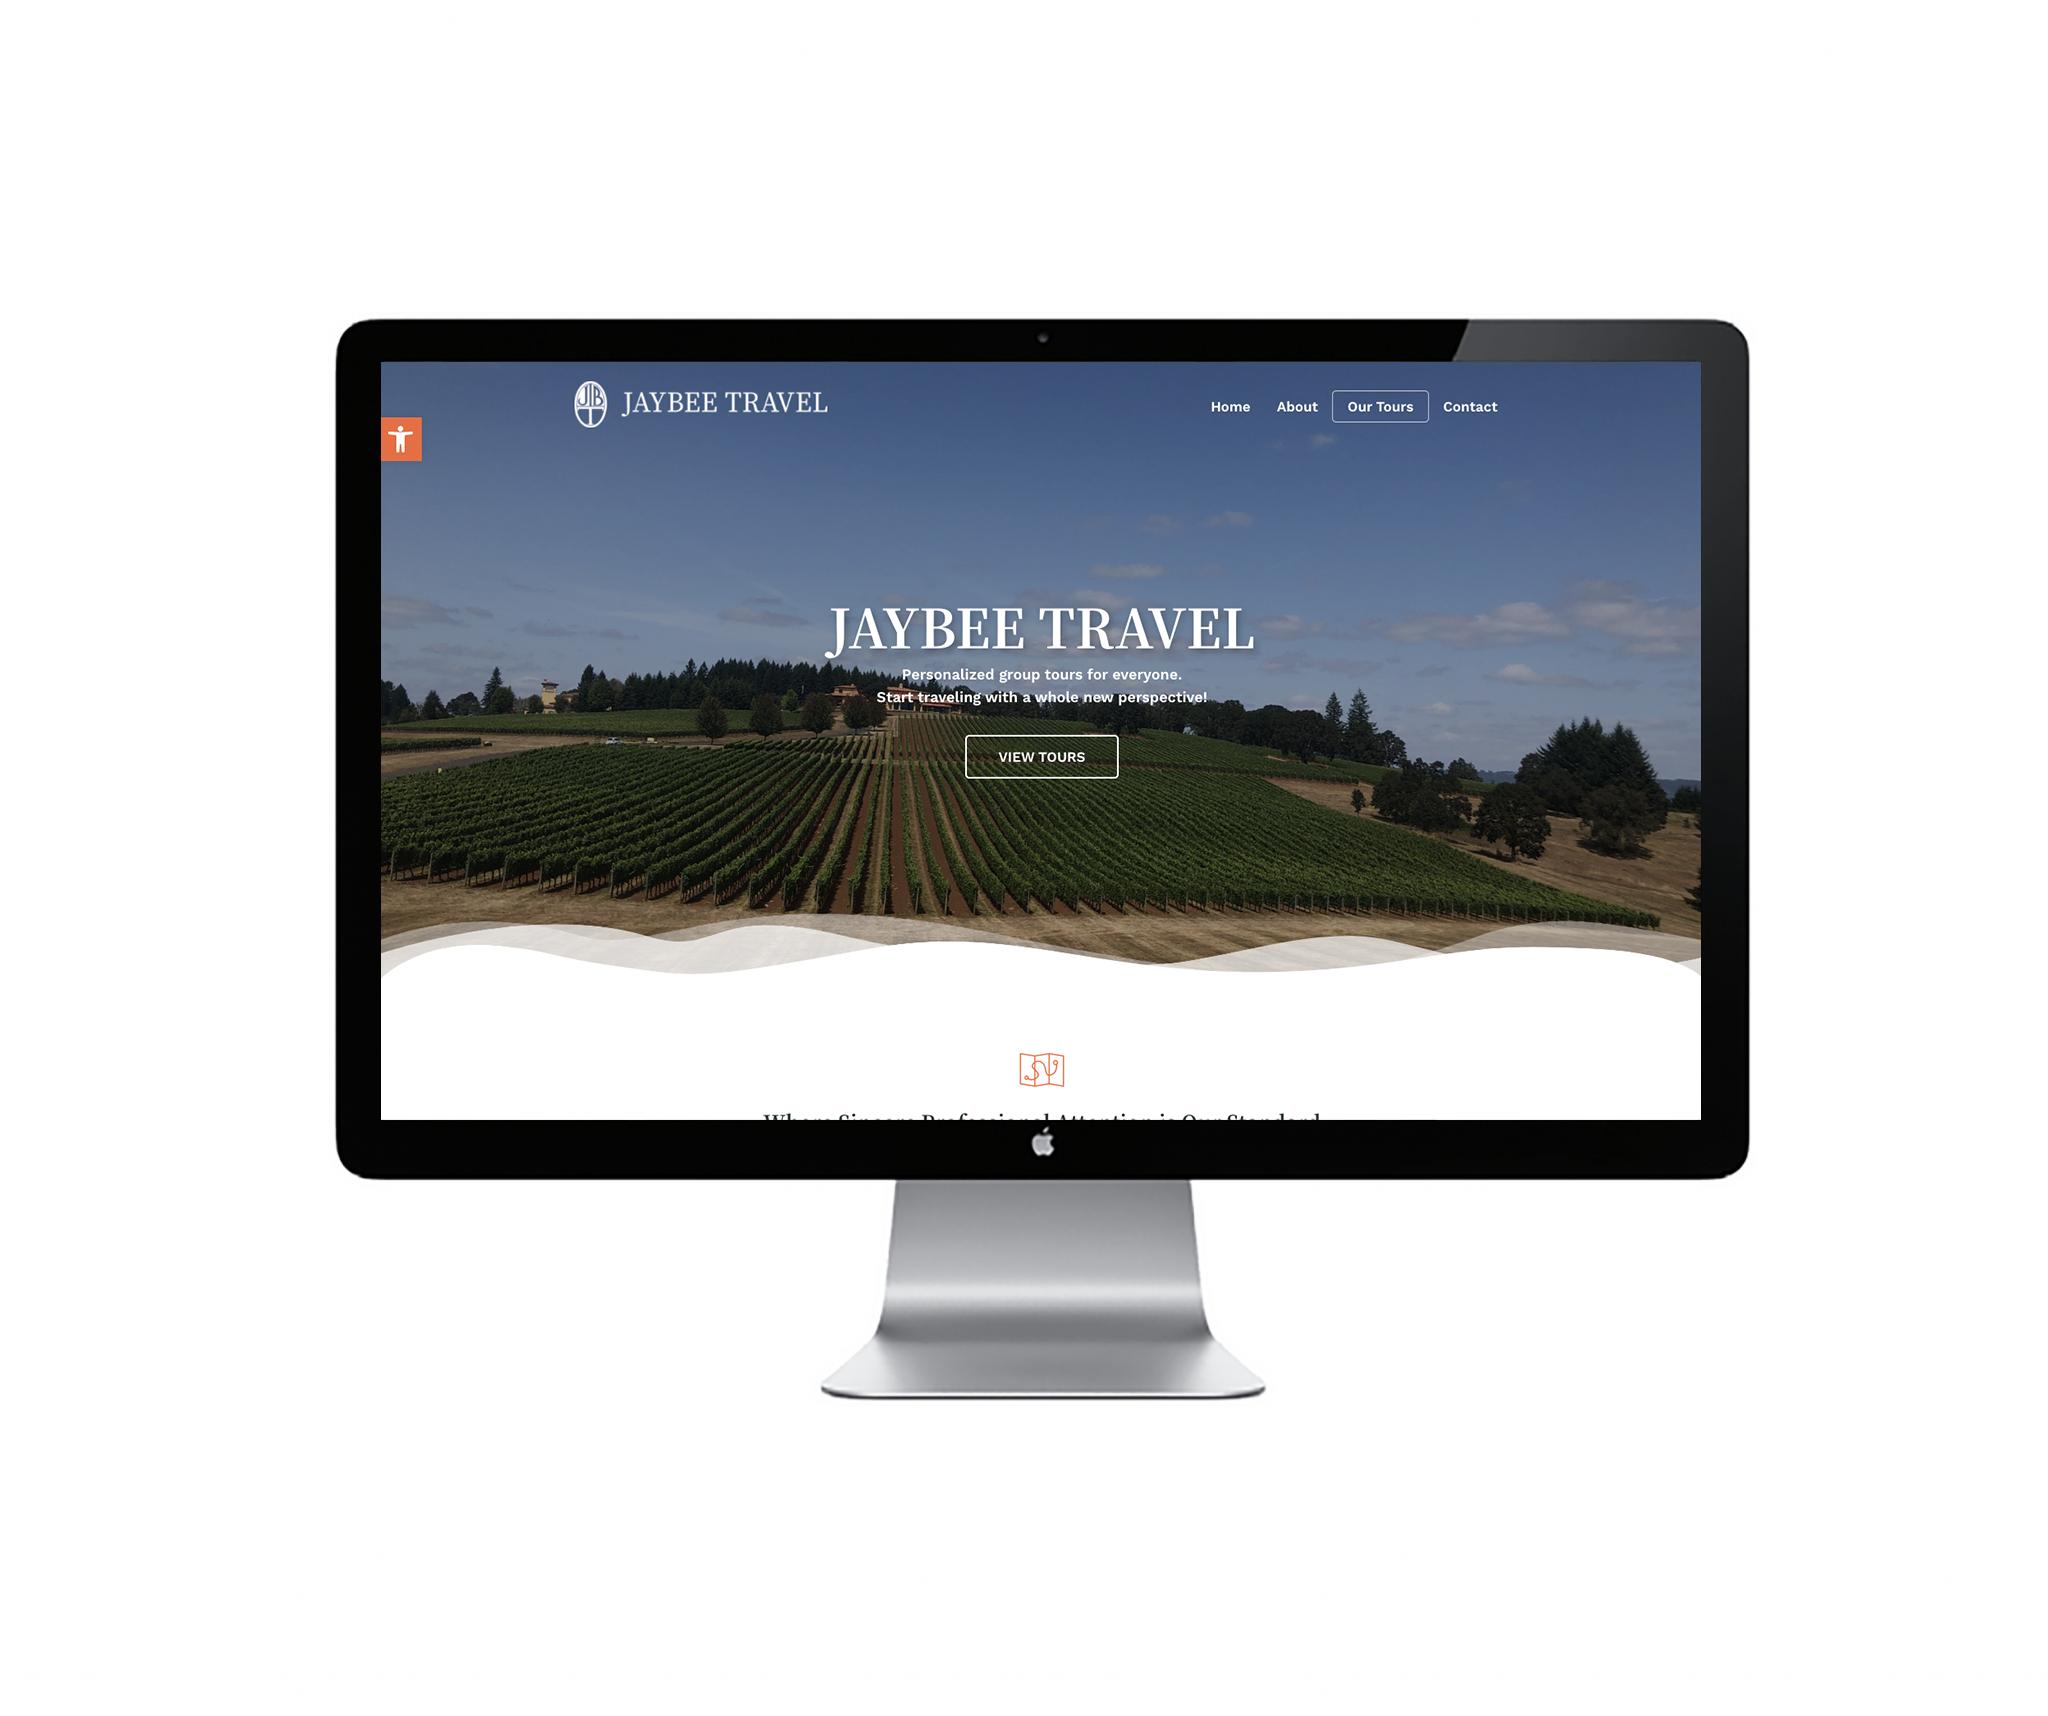 jaybee travel website cover